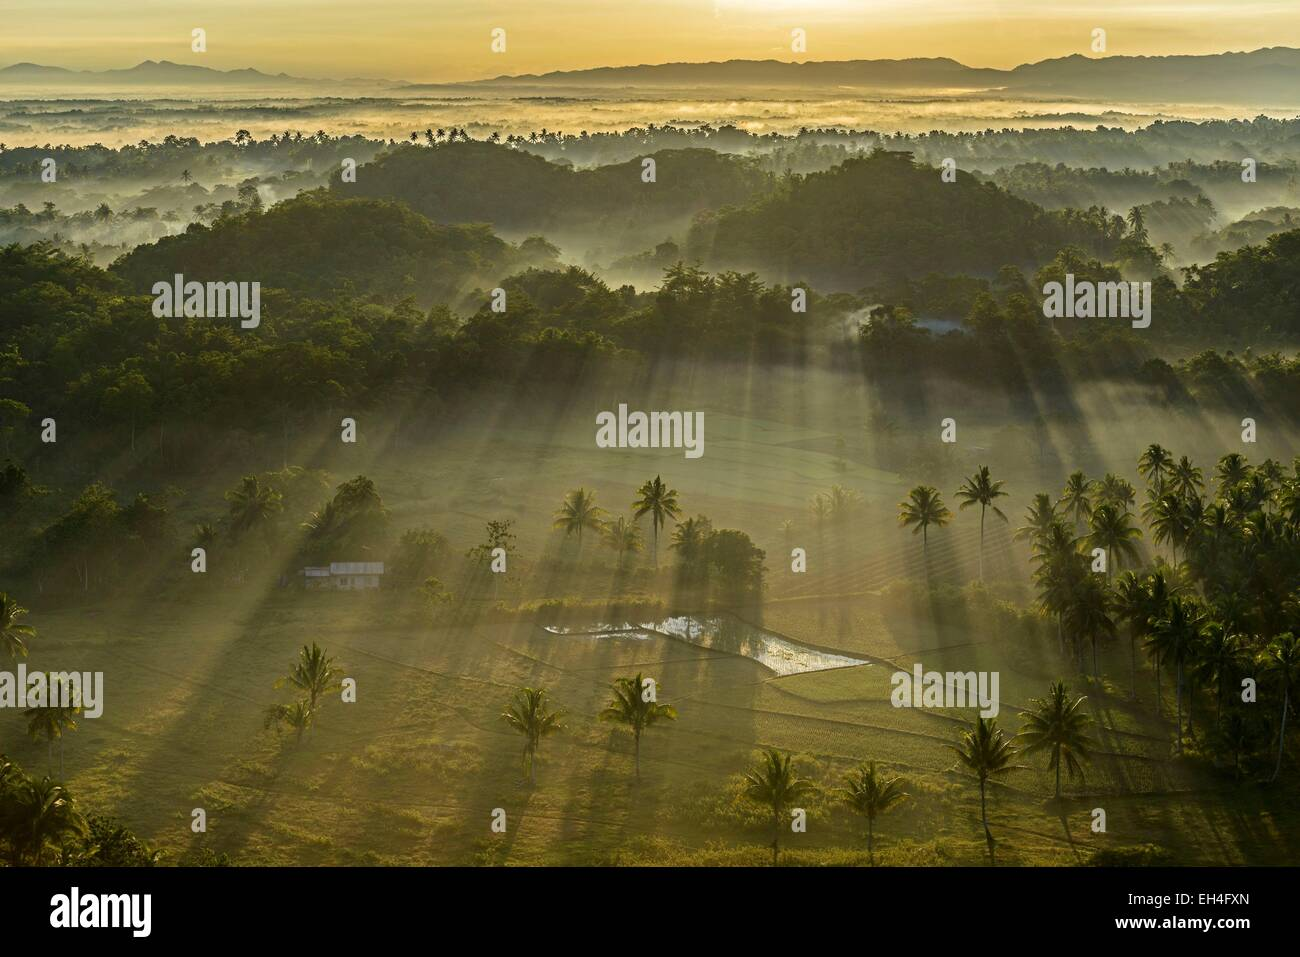 Filippine, Visayas arcipelago, l'isola di Bohol, Carmen area, risaie nella Chocolate Hills di sunrise Immagini Stock